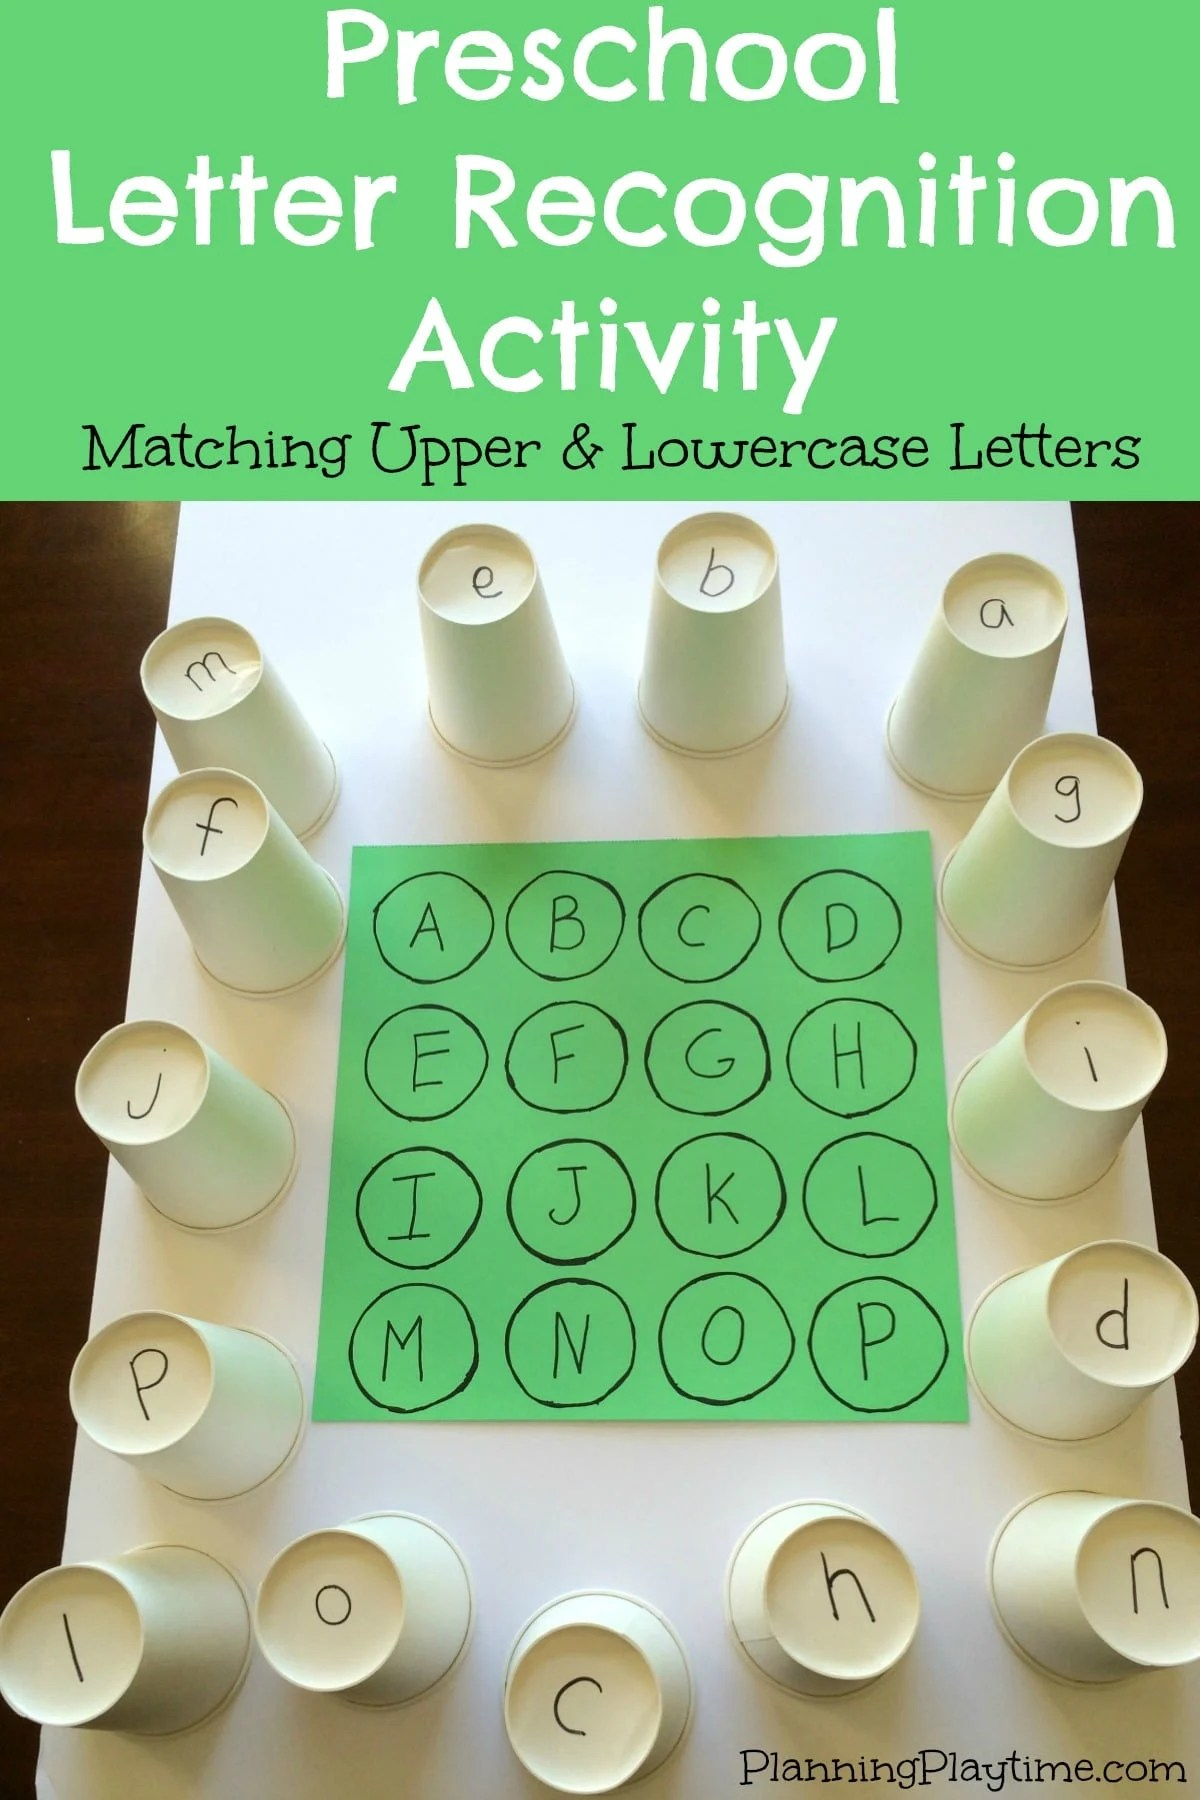 Letter Recognition For Preschoolers